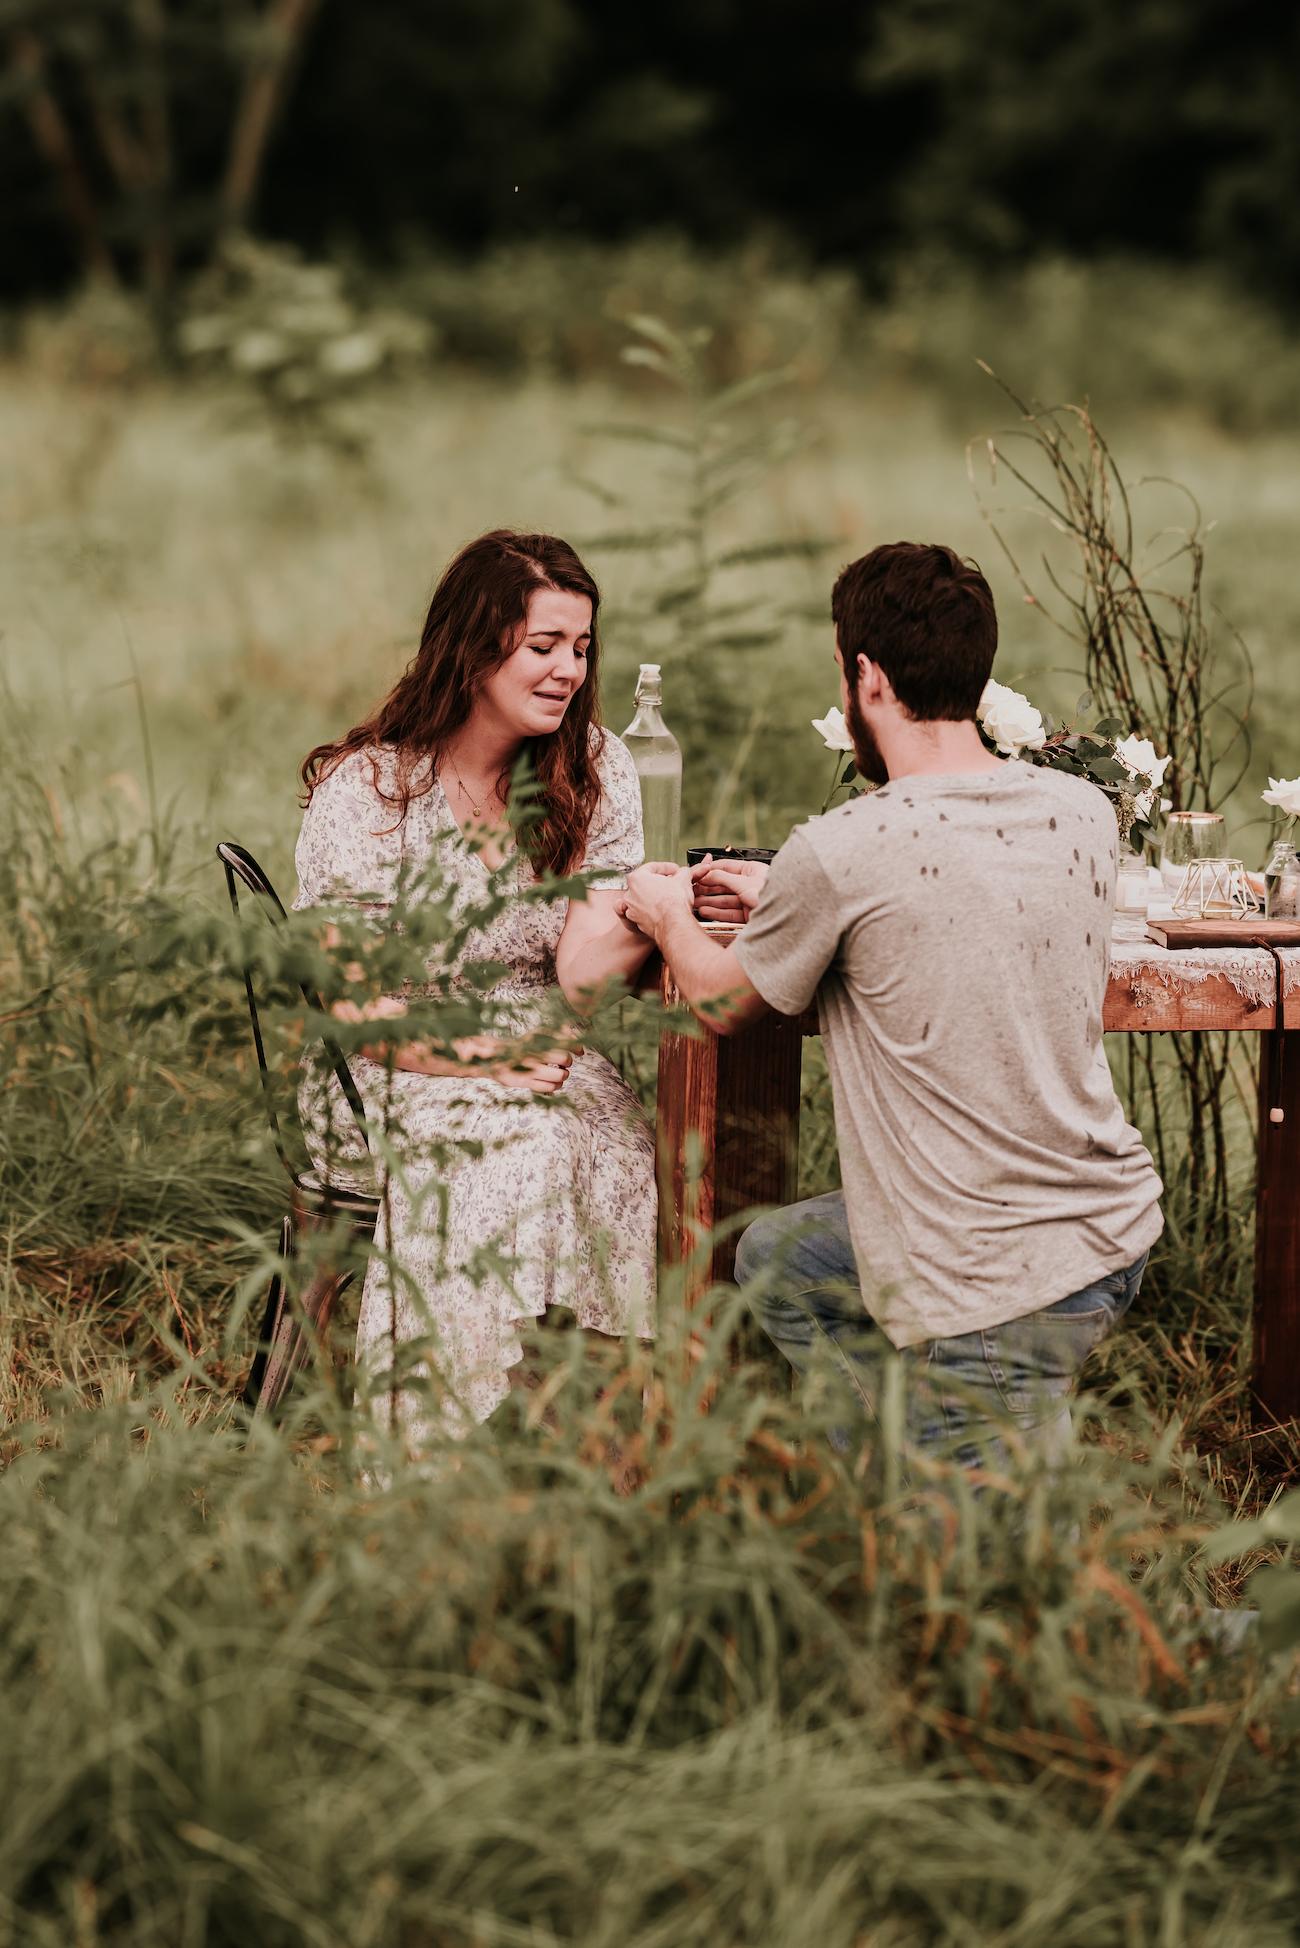 tampa-engagement-proposal-photography-47.jpeg